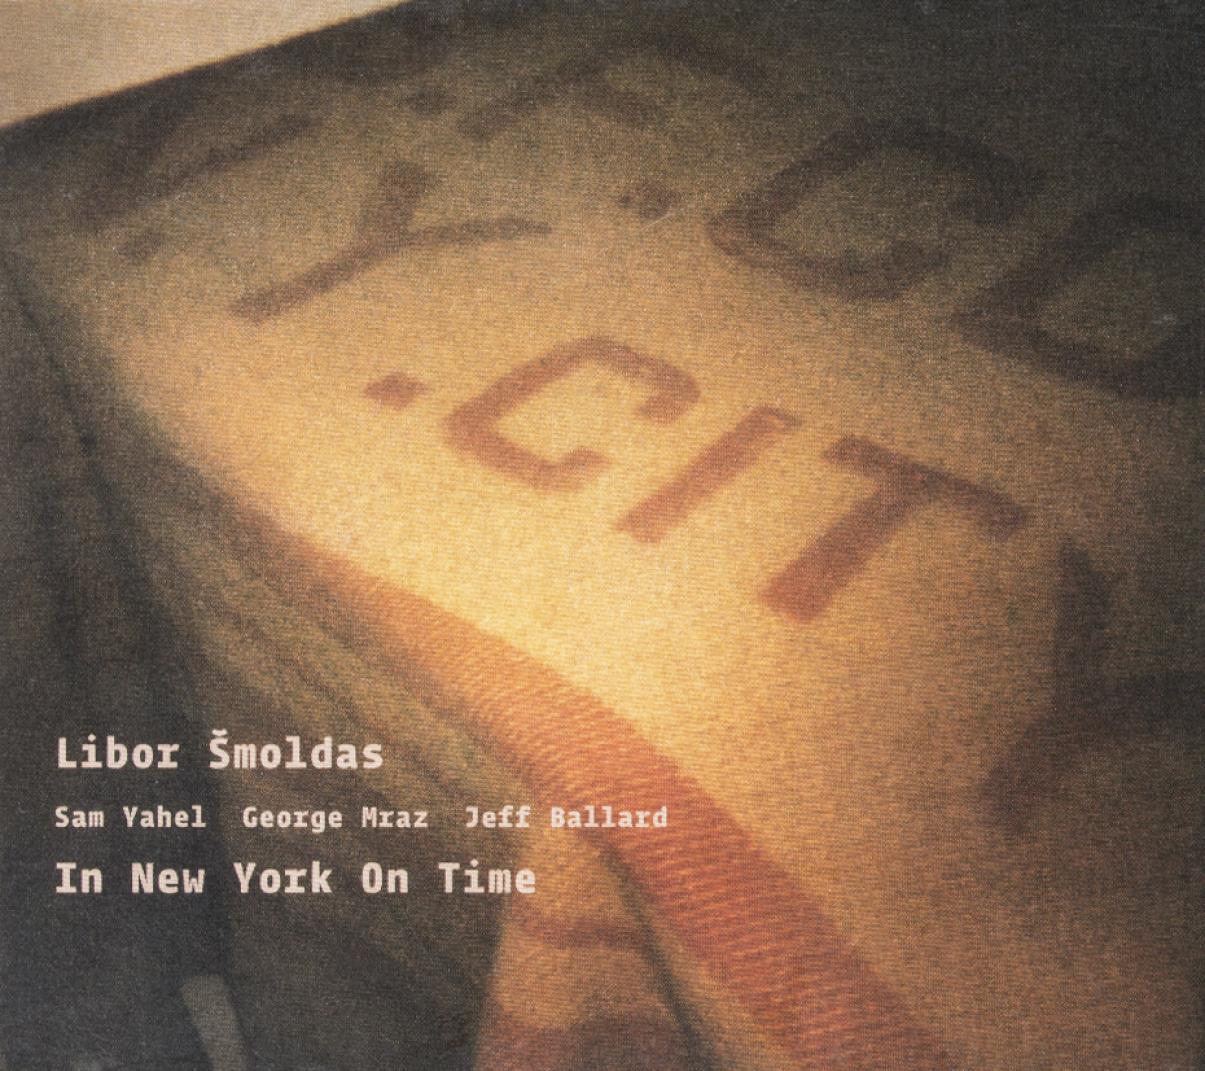 Libor Šmoldas: In New York On Time